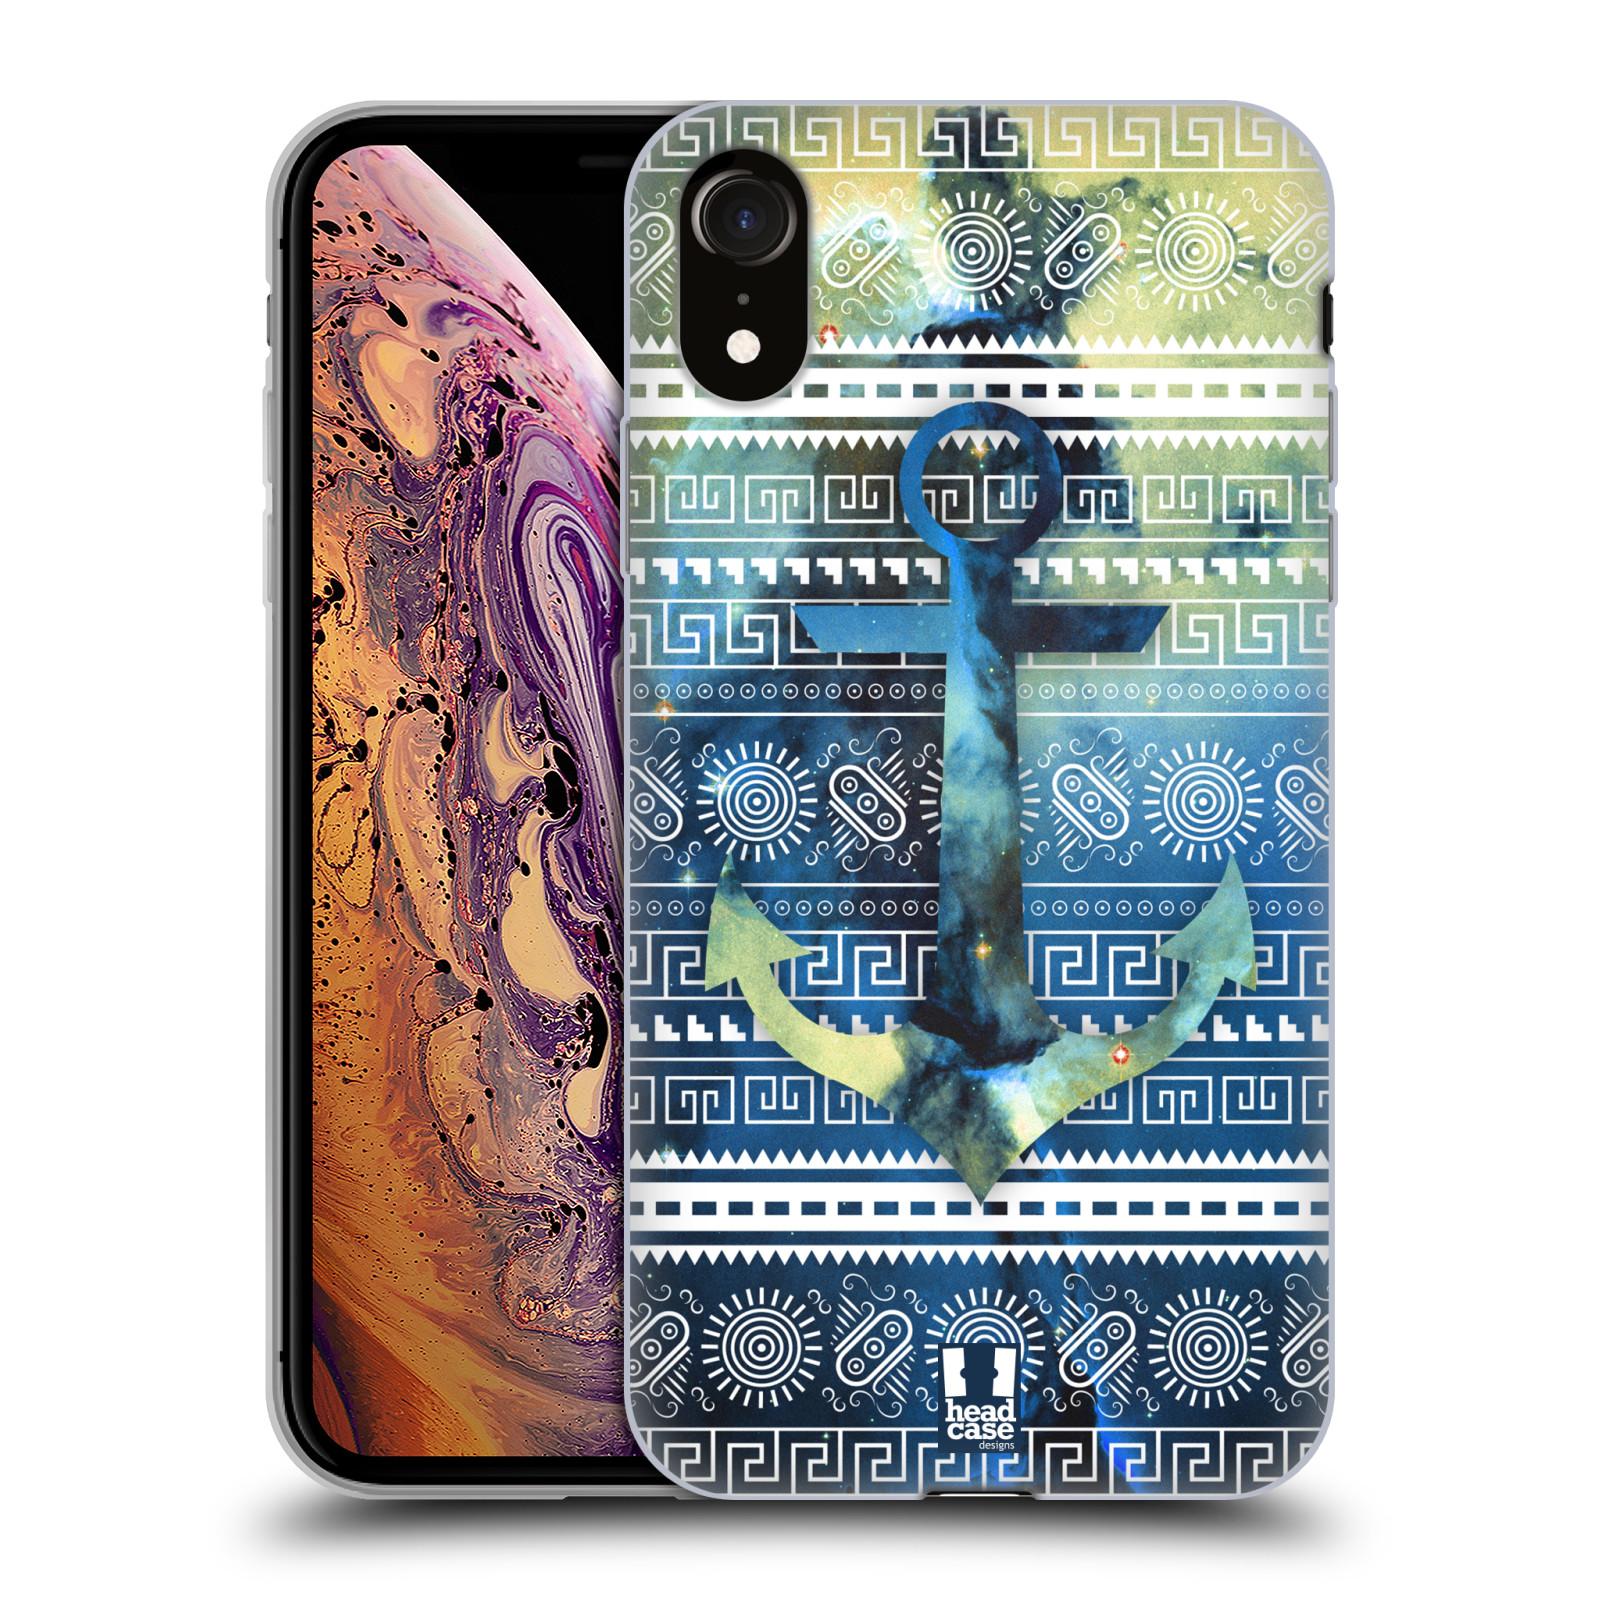 Silikonové pouzdro na mobil Apple iPhone XR - Head Case - NEBULA KOTVA